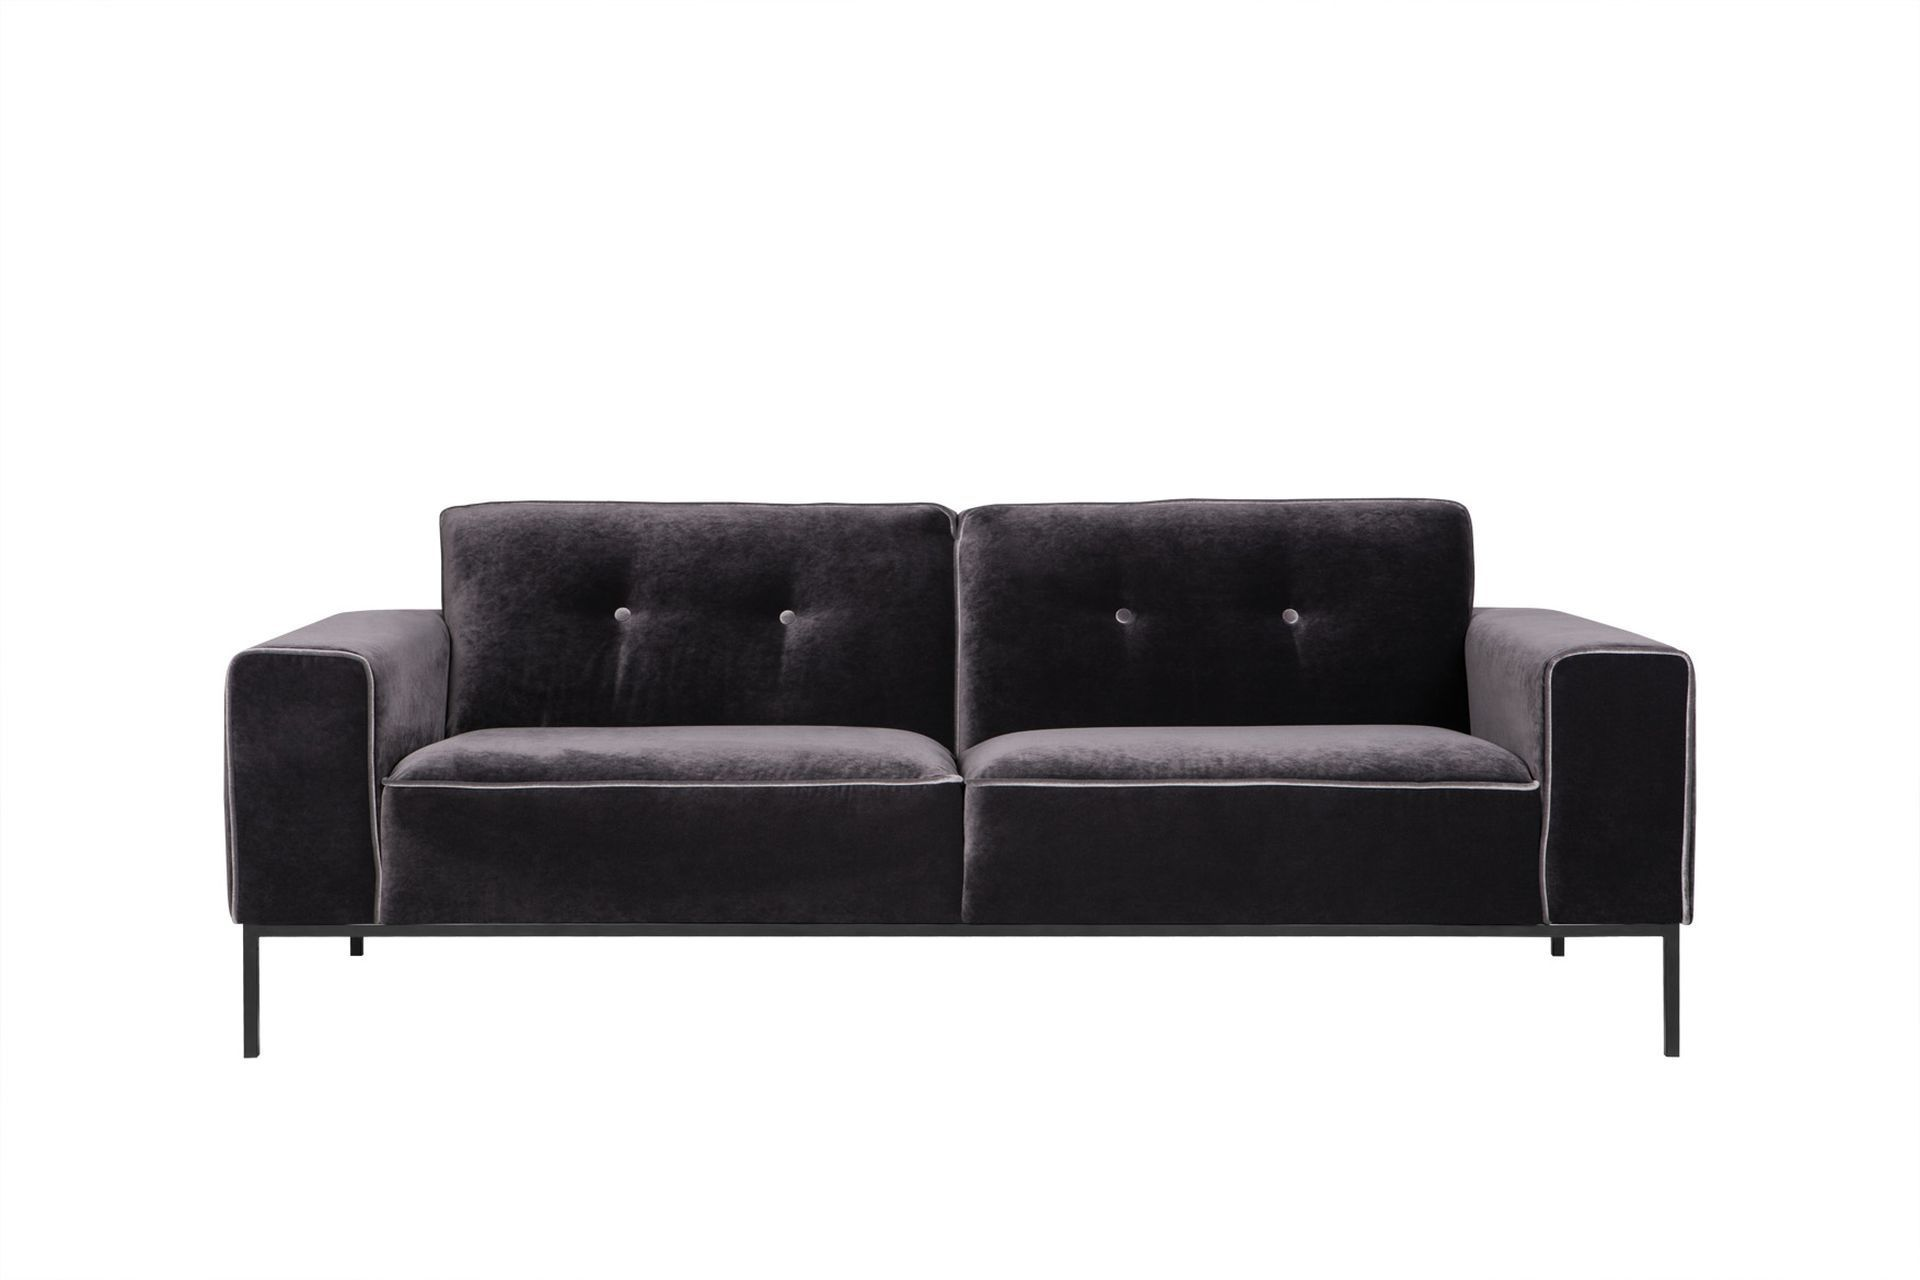 SITS трехместный диван ville МебеРь